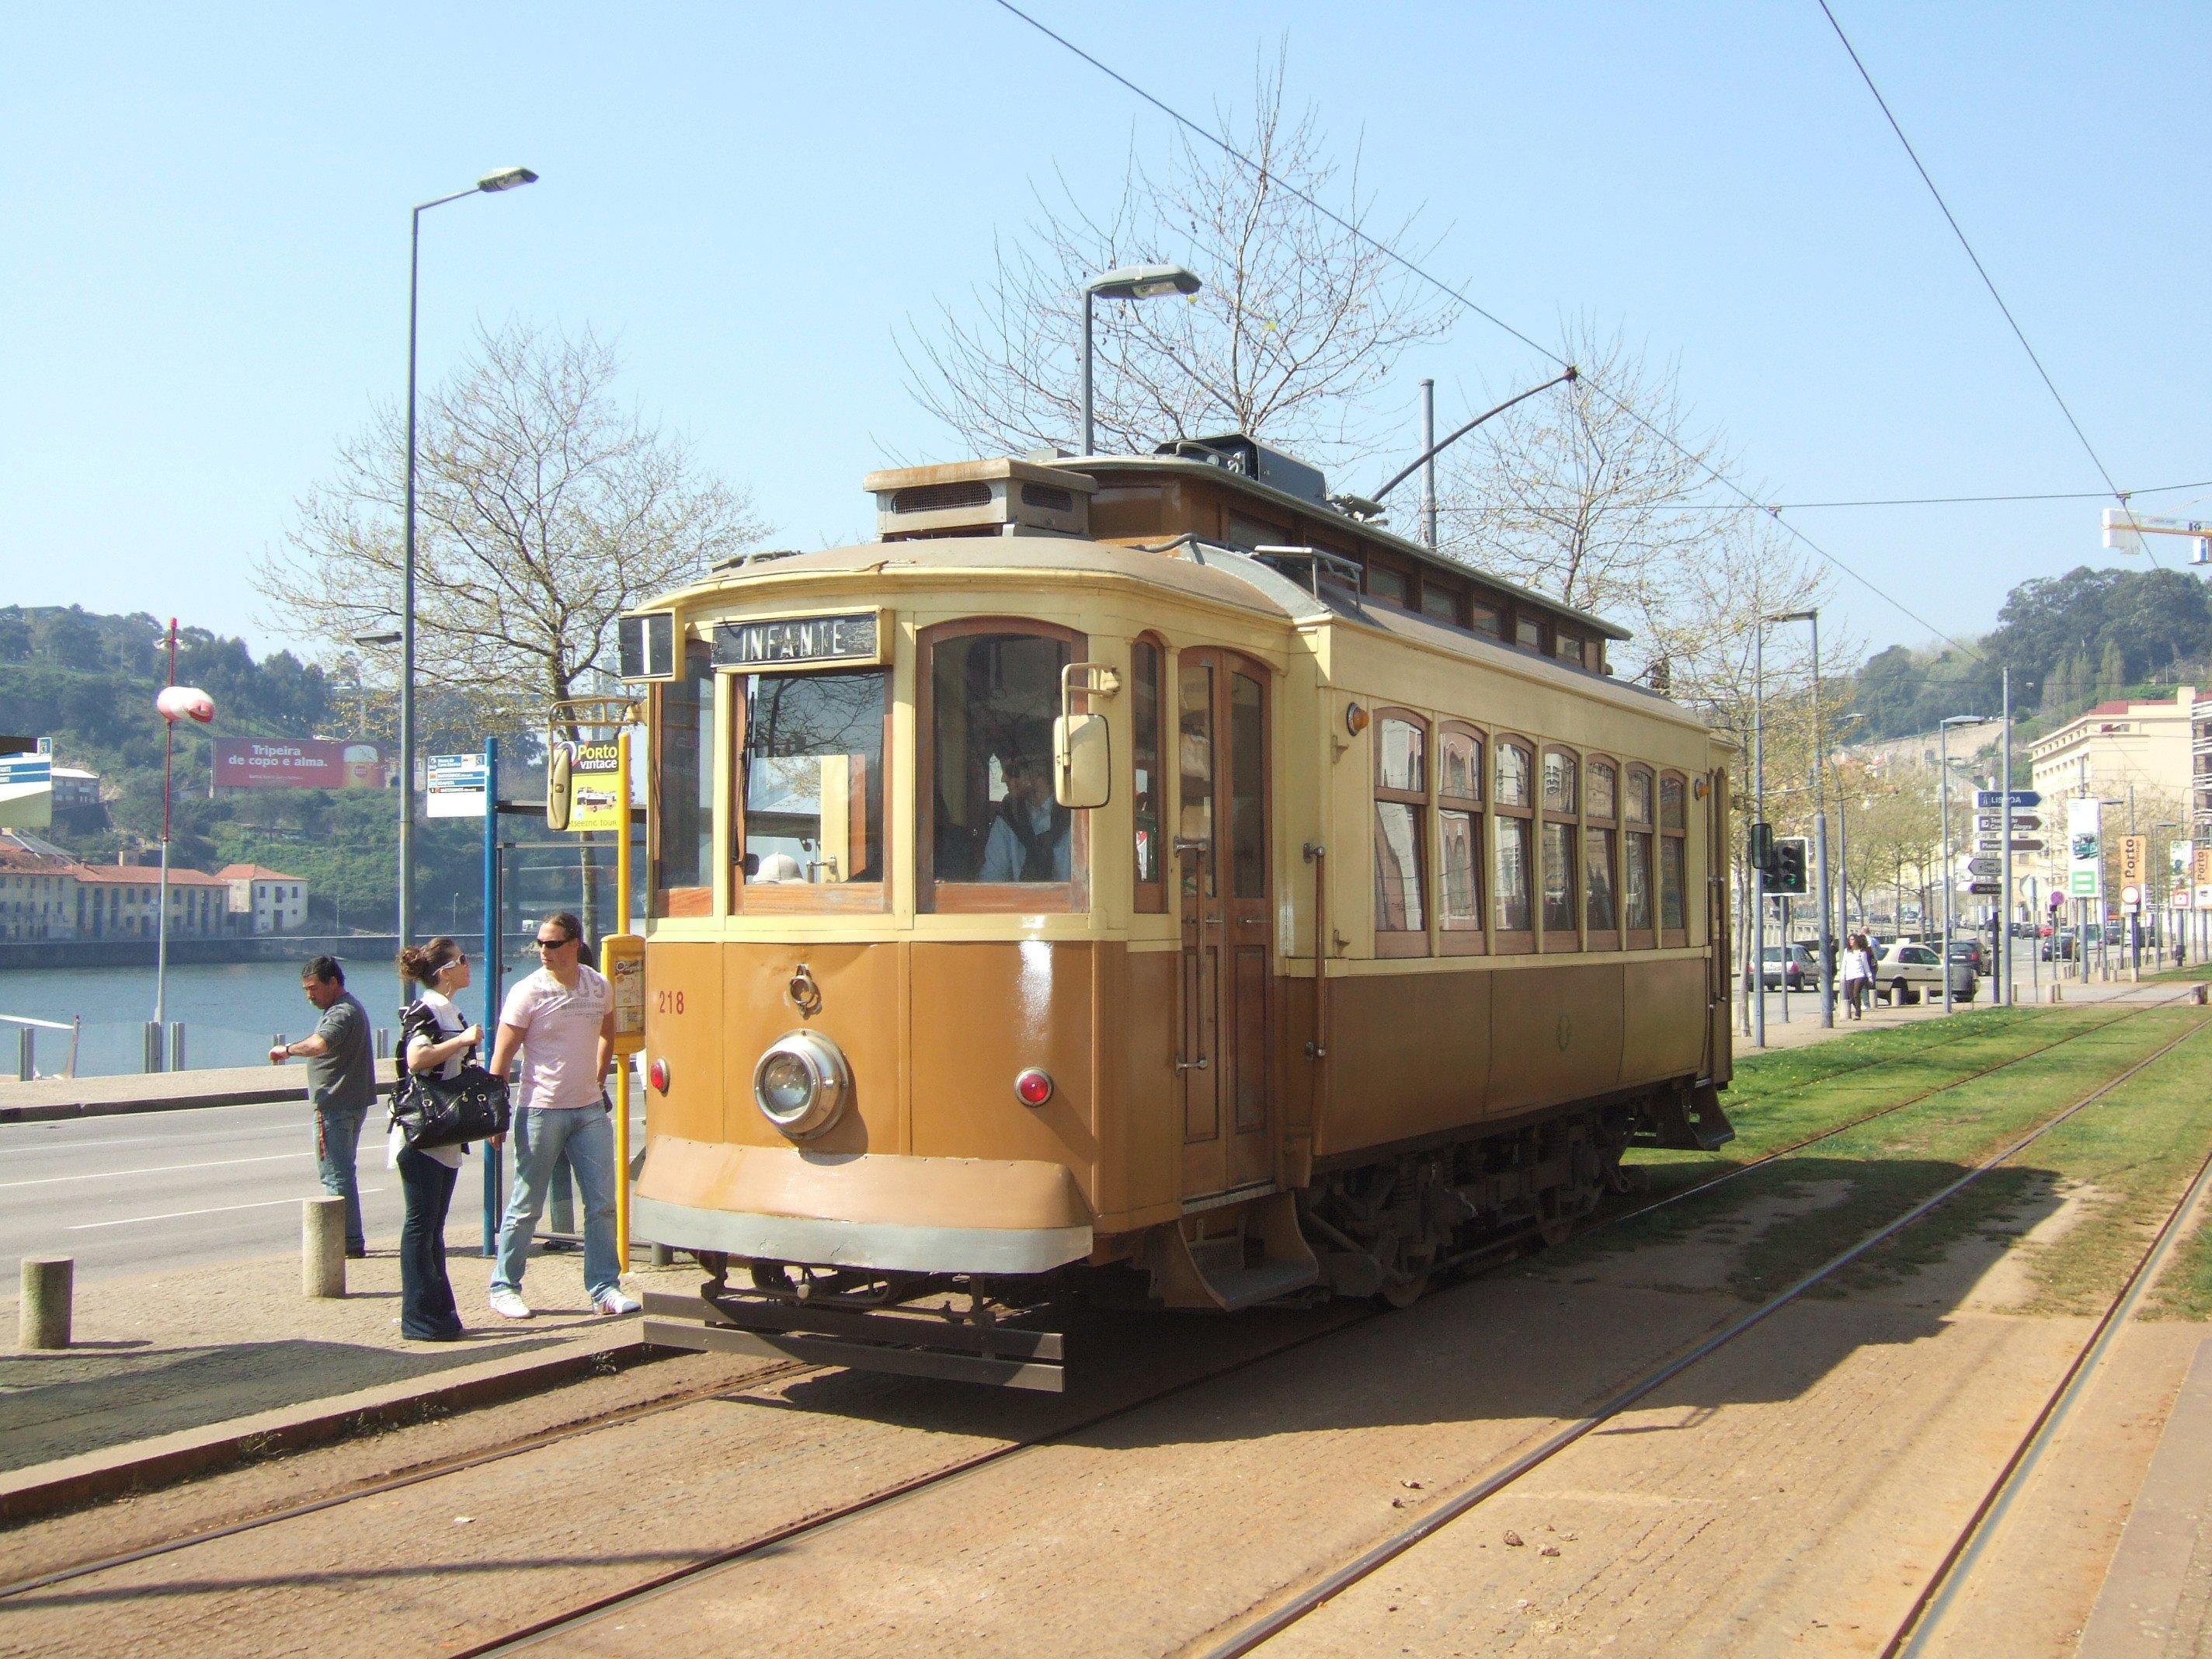 trams_de_porto_portugal_5416334749